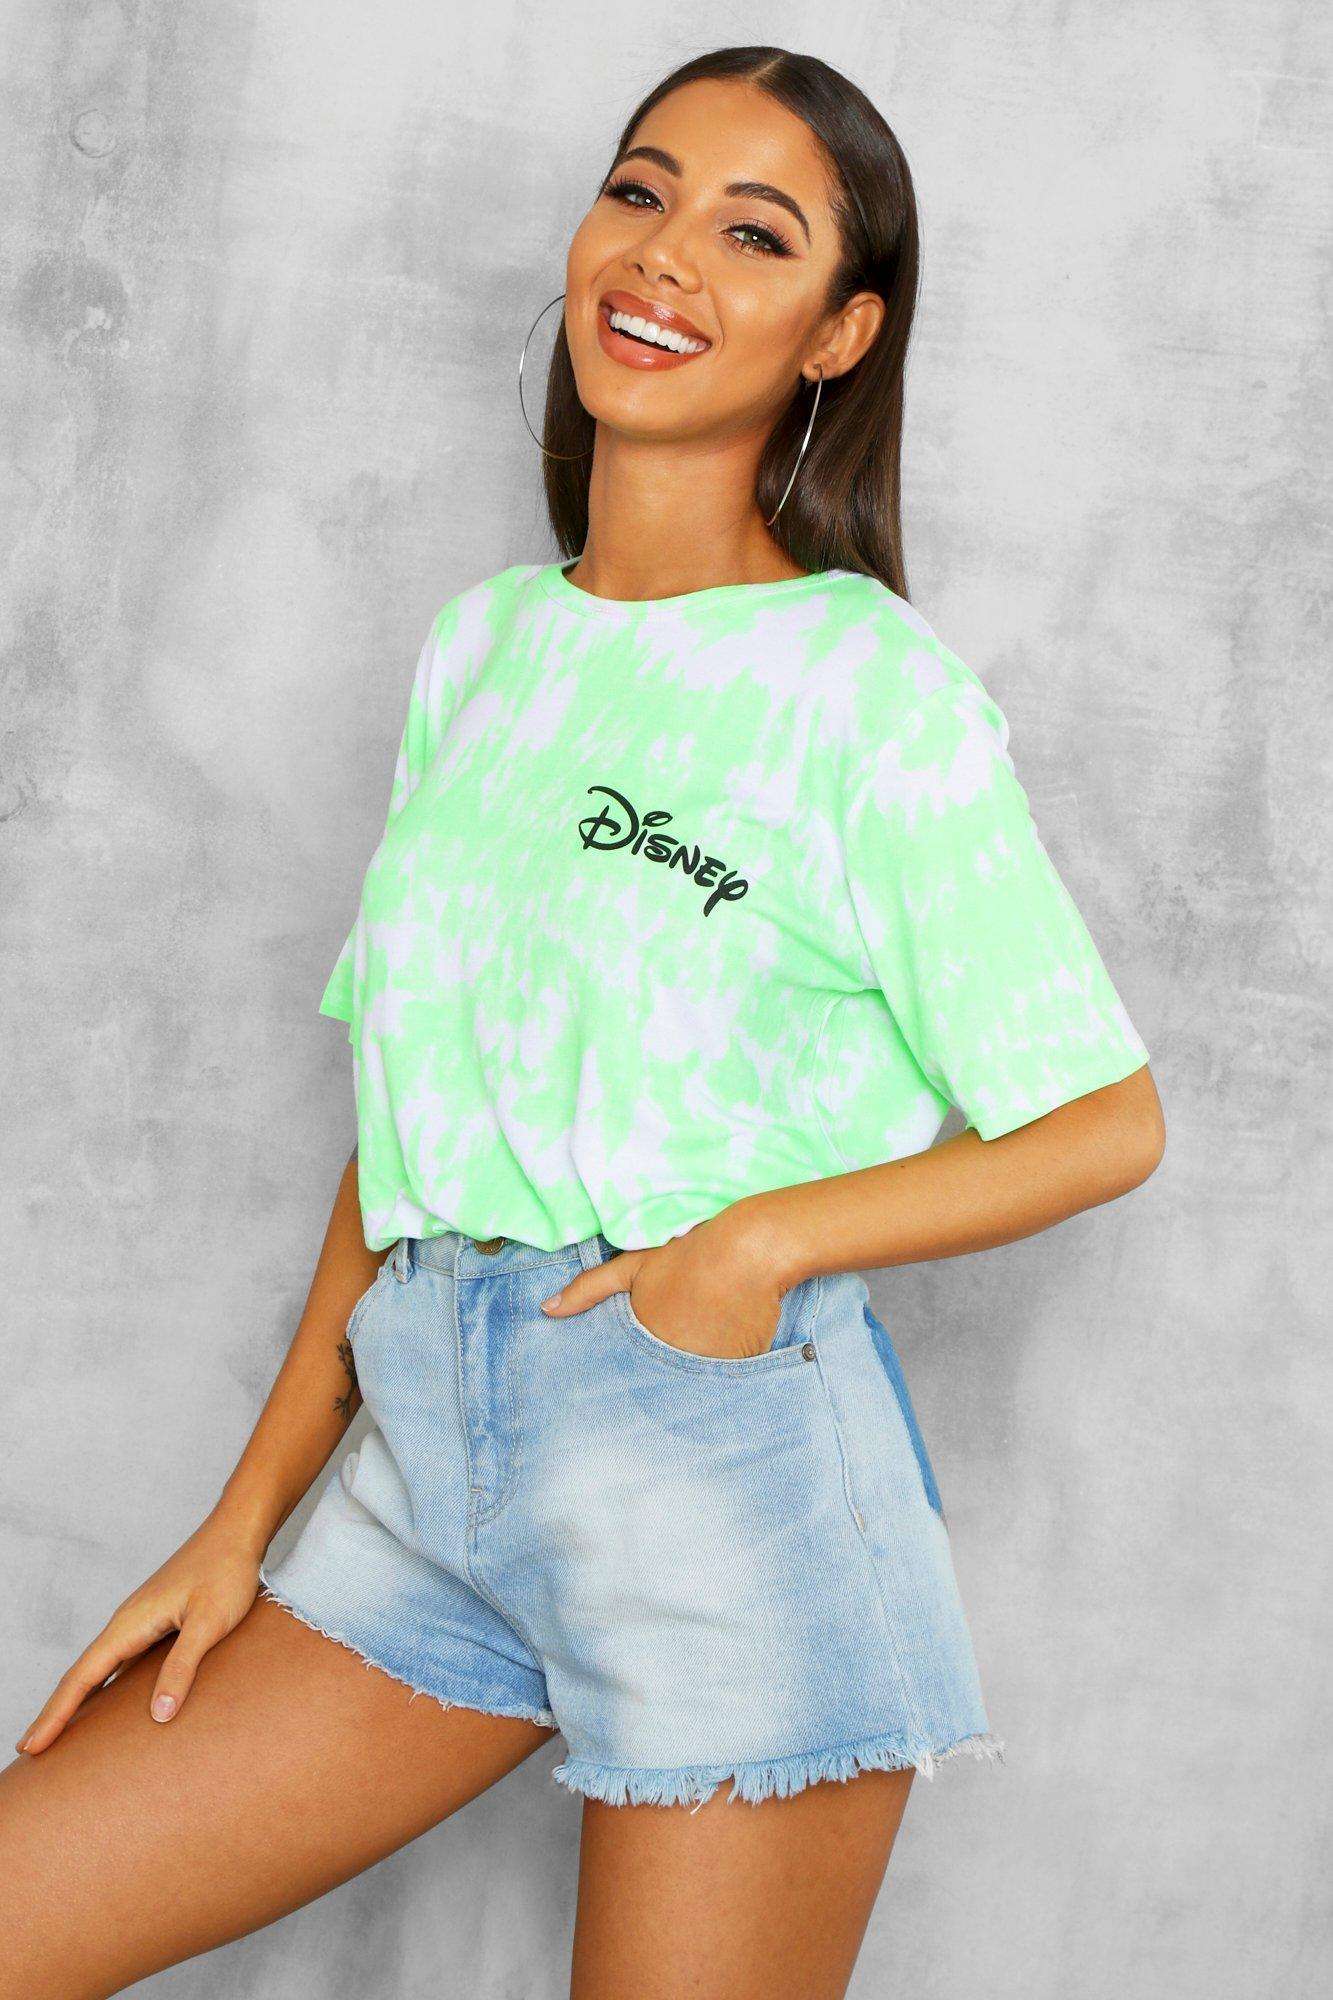 Womens Lizenziertes Disney T-Shirt mit neonfarbenem Slogan - Limettengrün - 36, Limettengrün - Boohoo.com